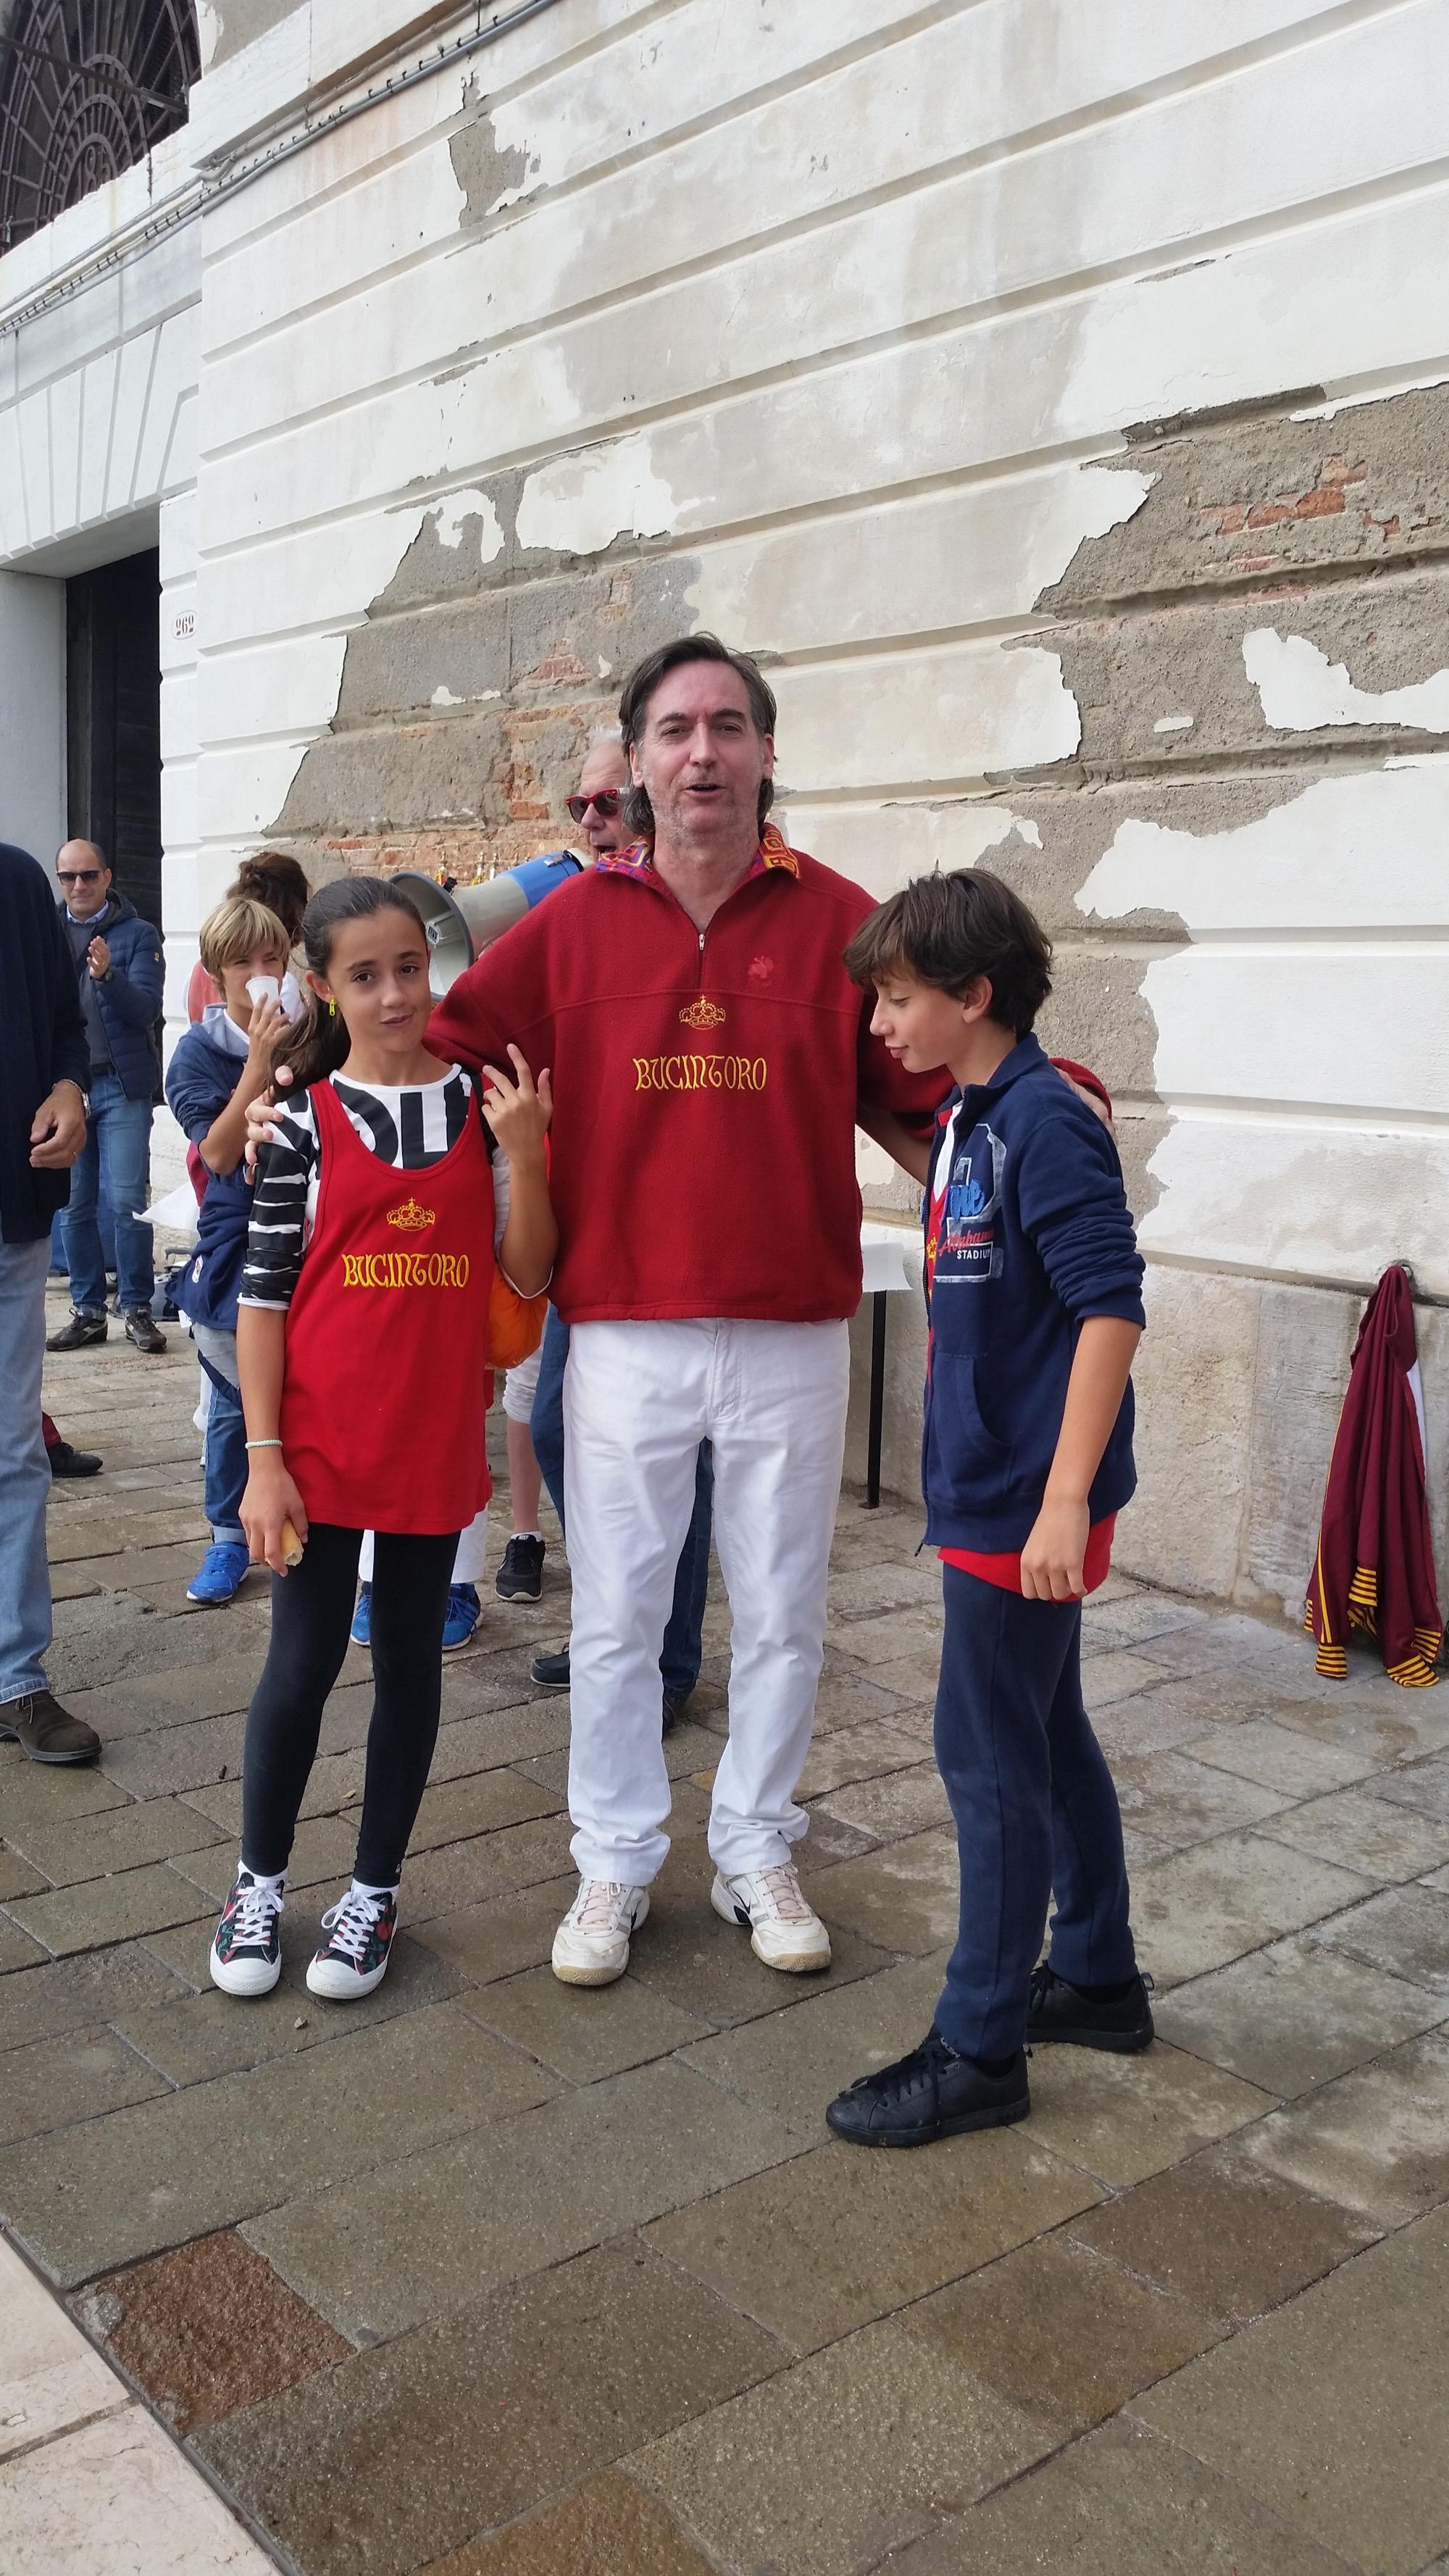 Giuseppe Dalmartello, Bianca Manfredonia e Carlo Manfredonia